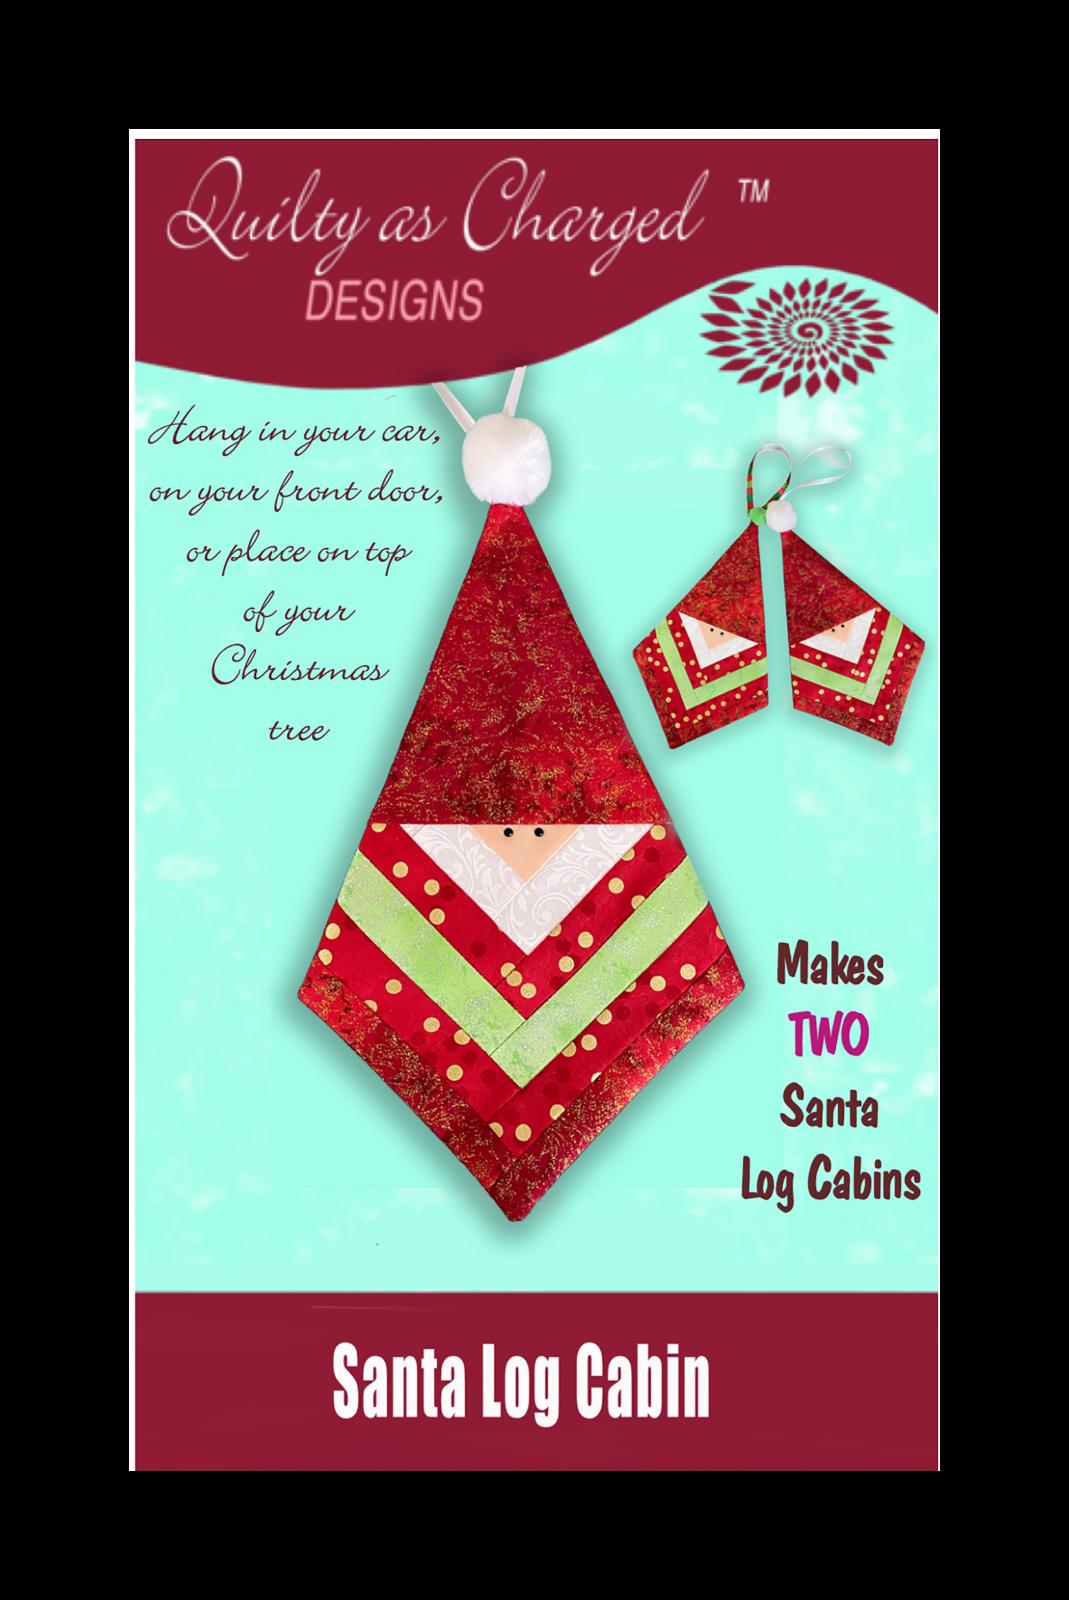 Santa Log Cabin KIT with Pattern - Makes TWO!